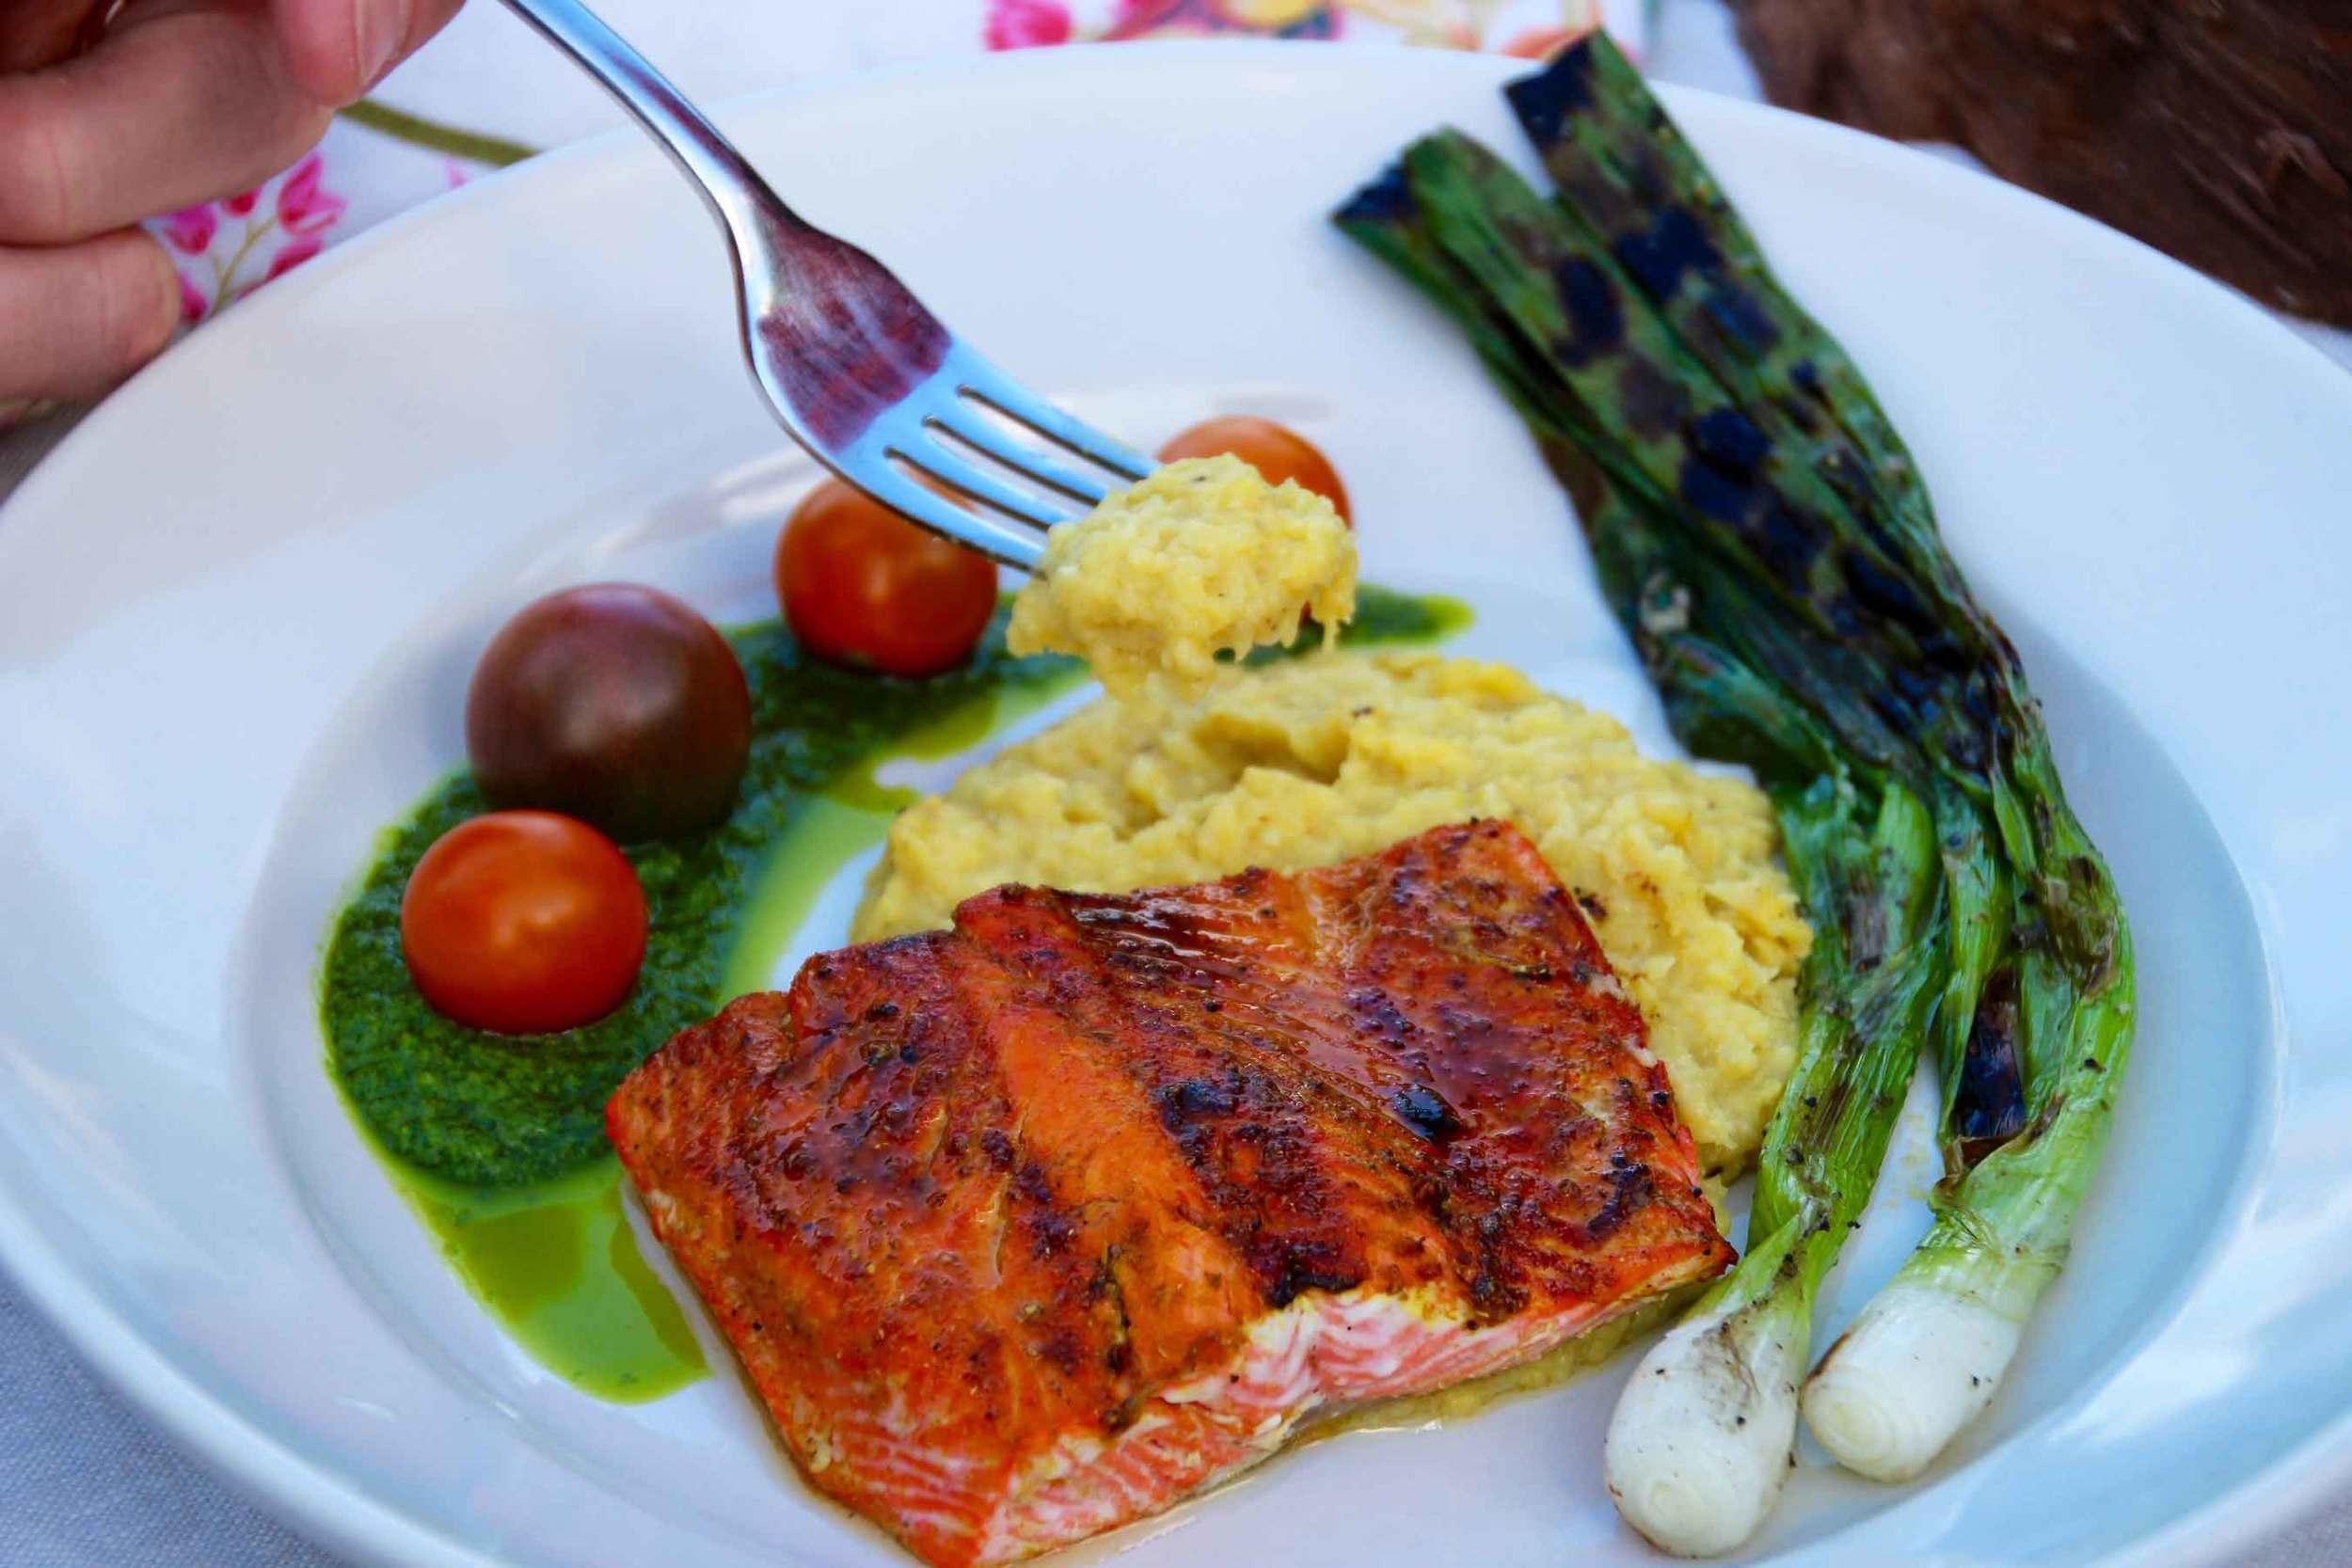 sockeye salmon, fresh polenta and basil oil recipes from Thread & Whisk